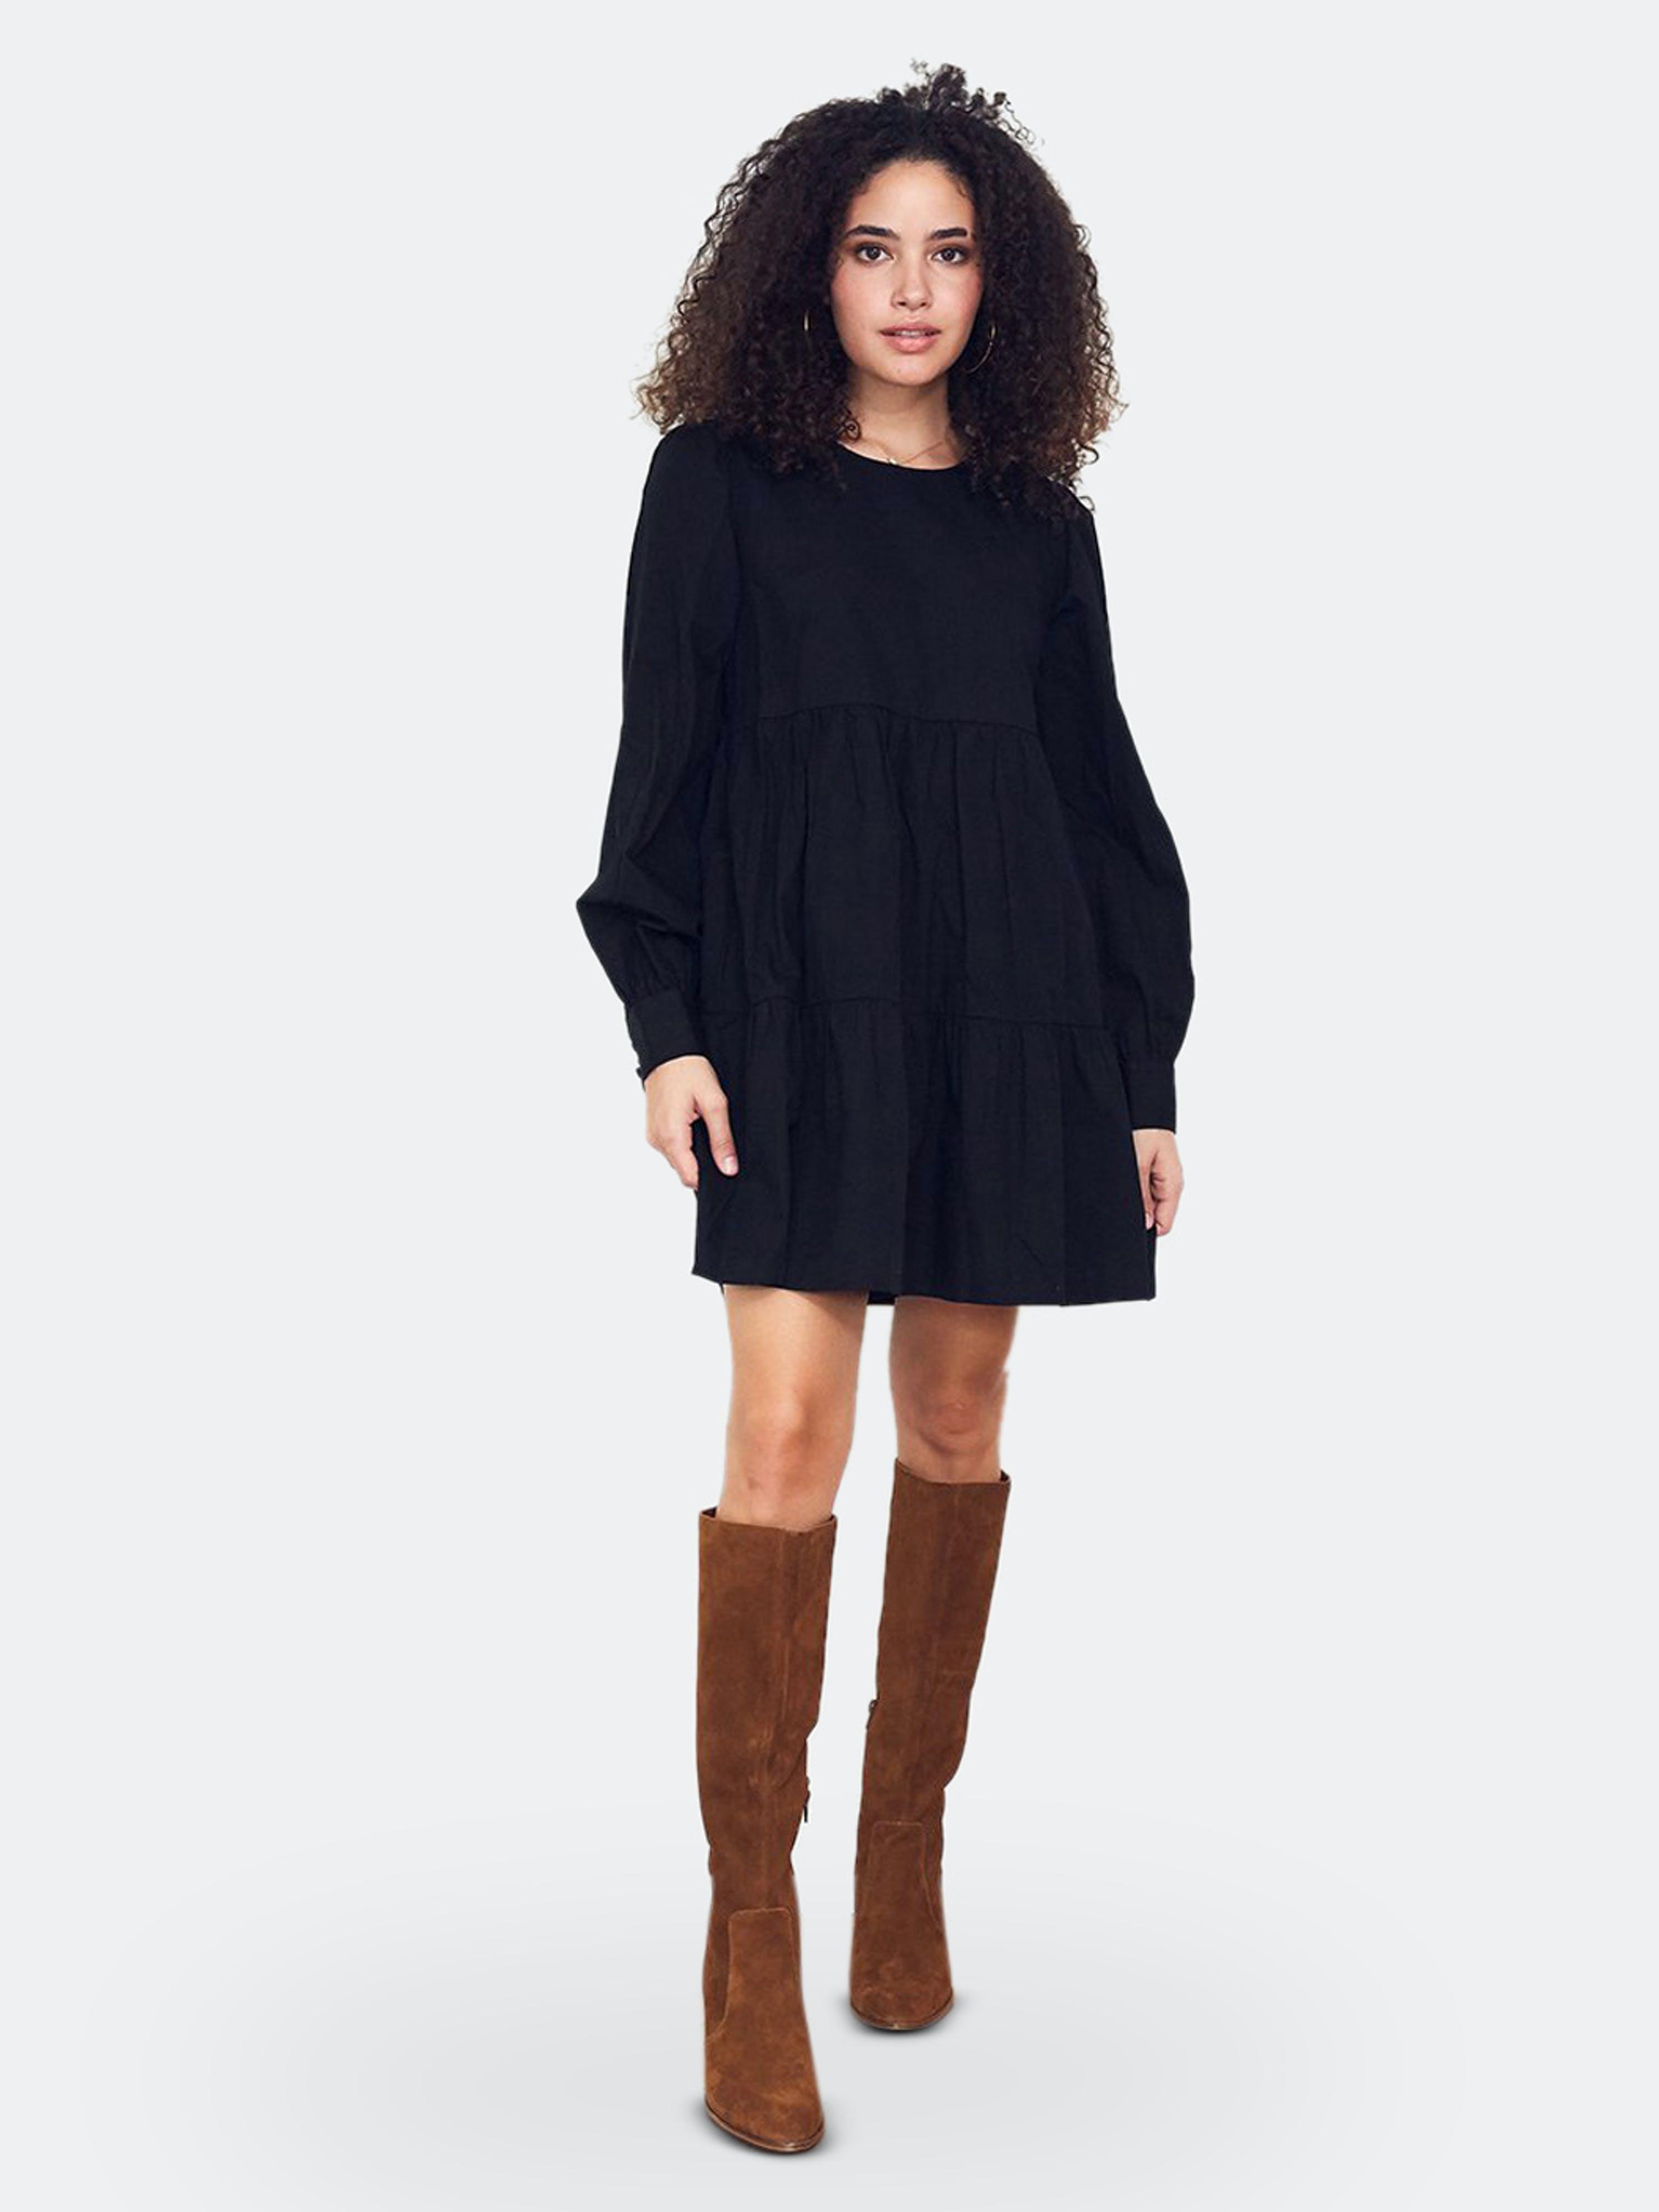 Paneros Clothing Black Currant Olivia Mini Dress  - Black